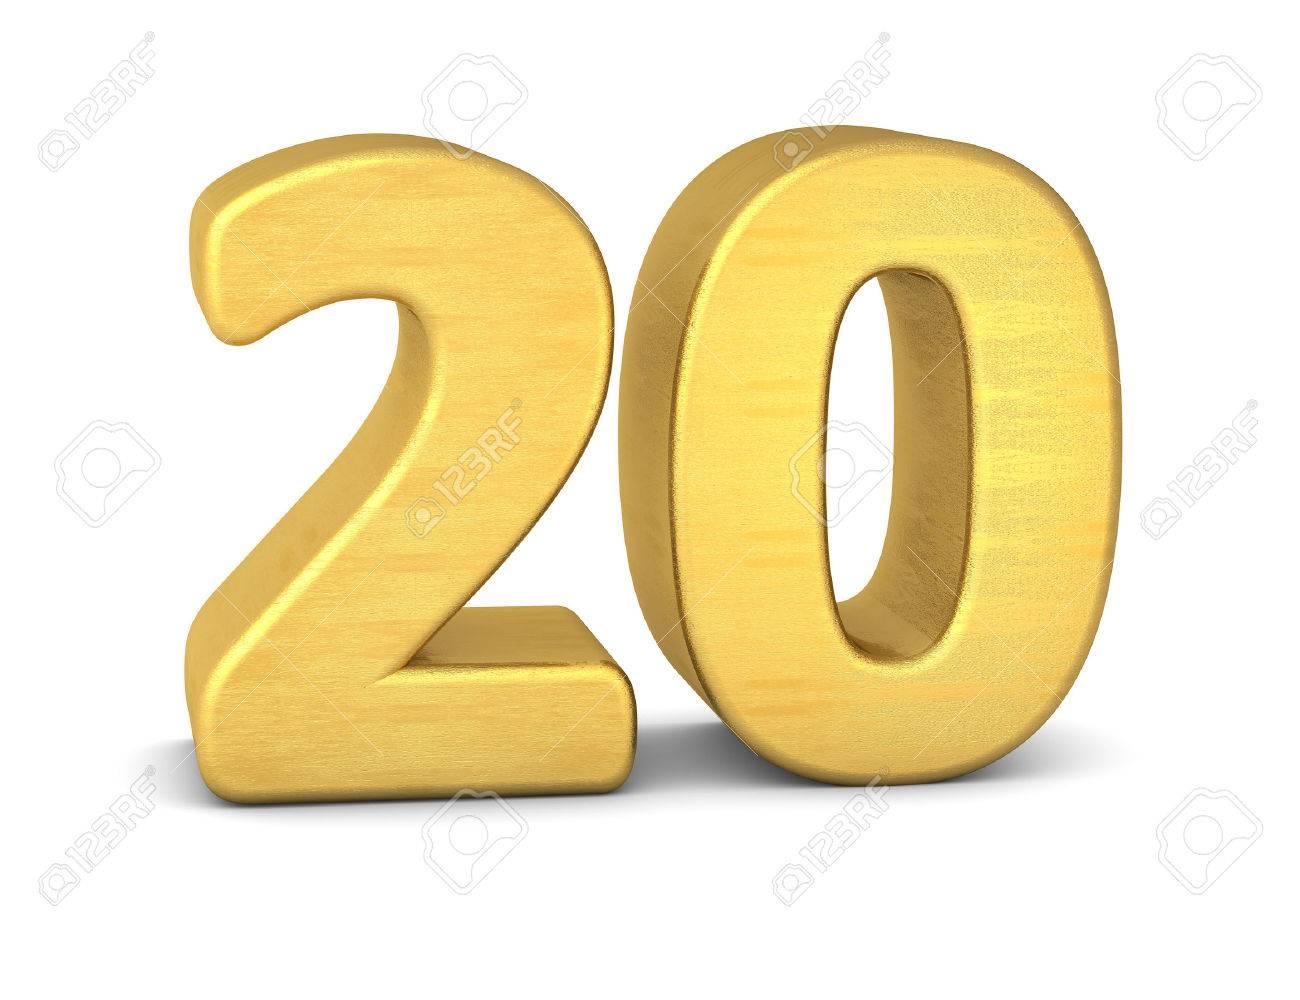 3 d の数 20 ゴールド ロイヤリティーフリーフォト ピクチャー 画像